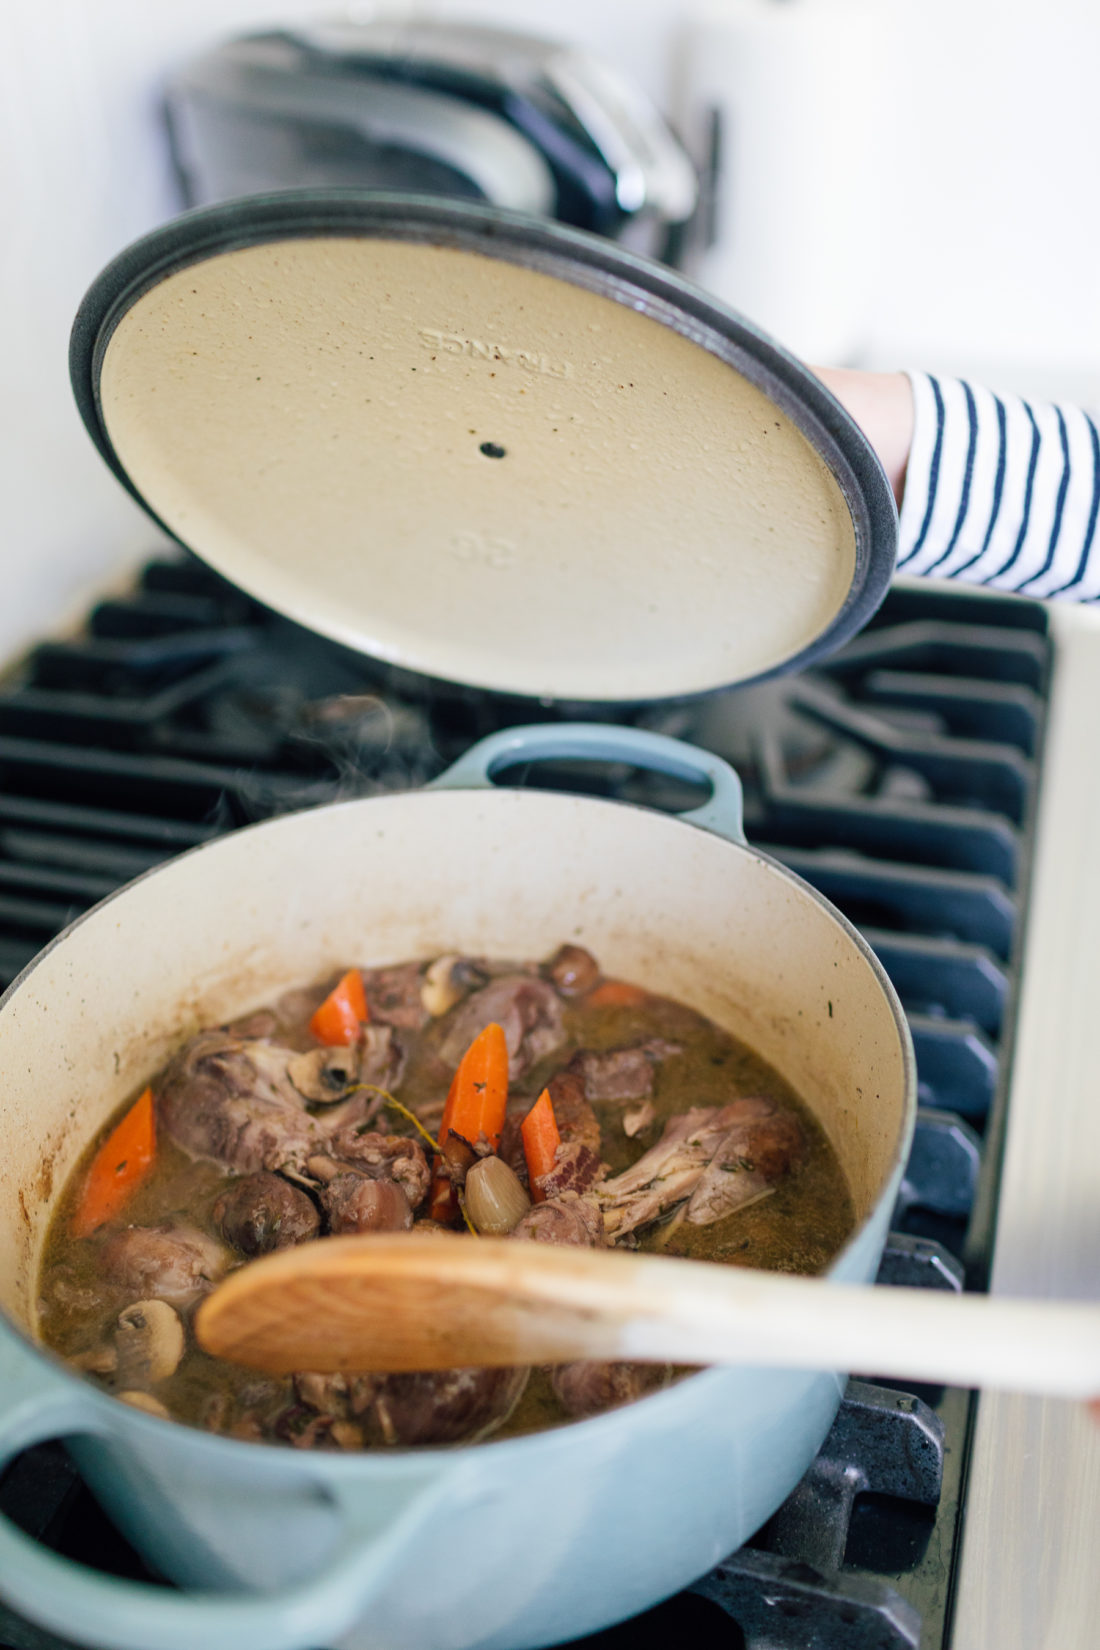 Eva Amurri Martino prepares Coq Au Vin in a Le Creuset Dutch Oven